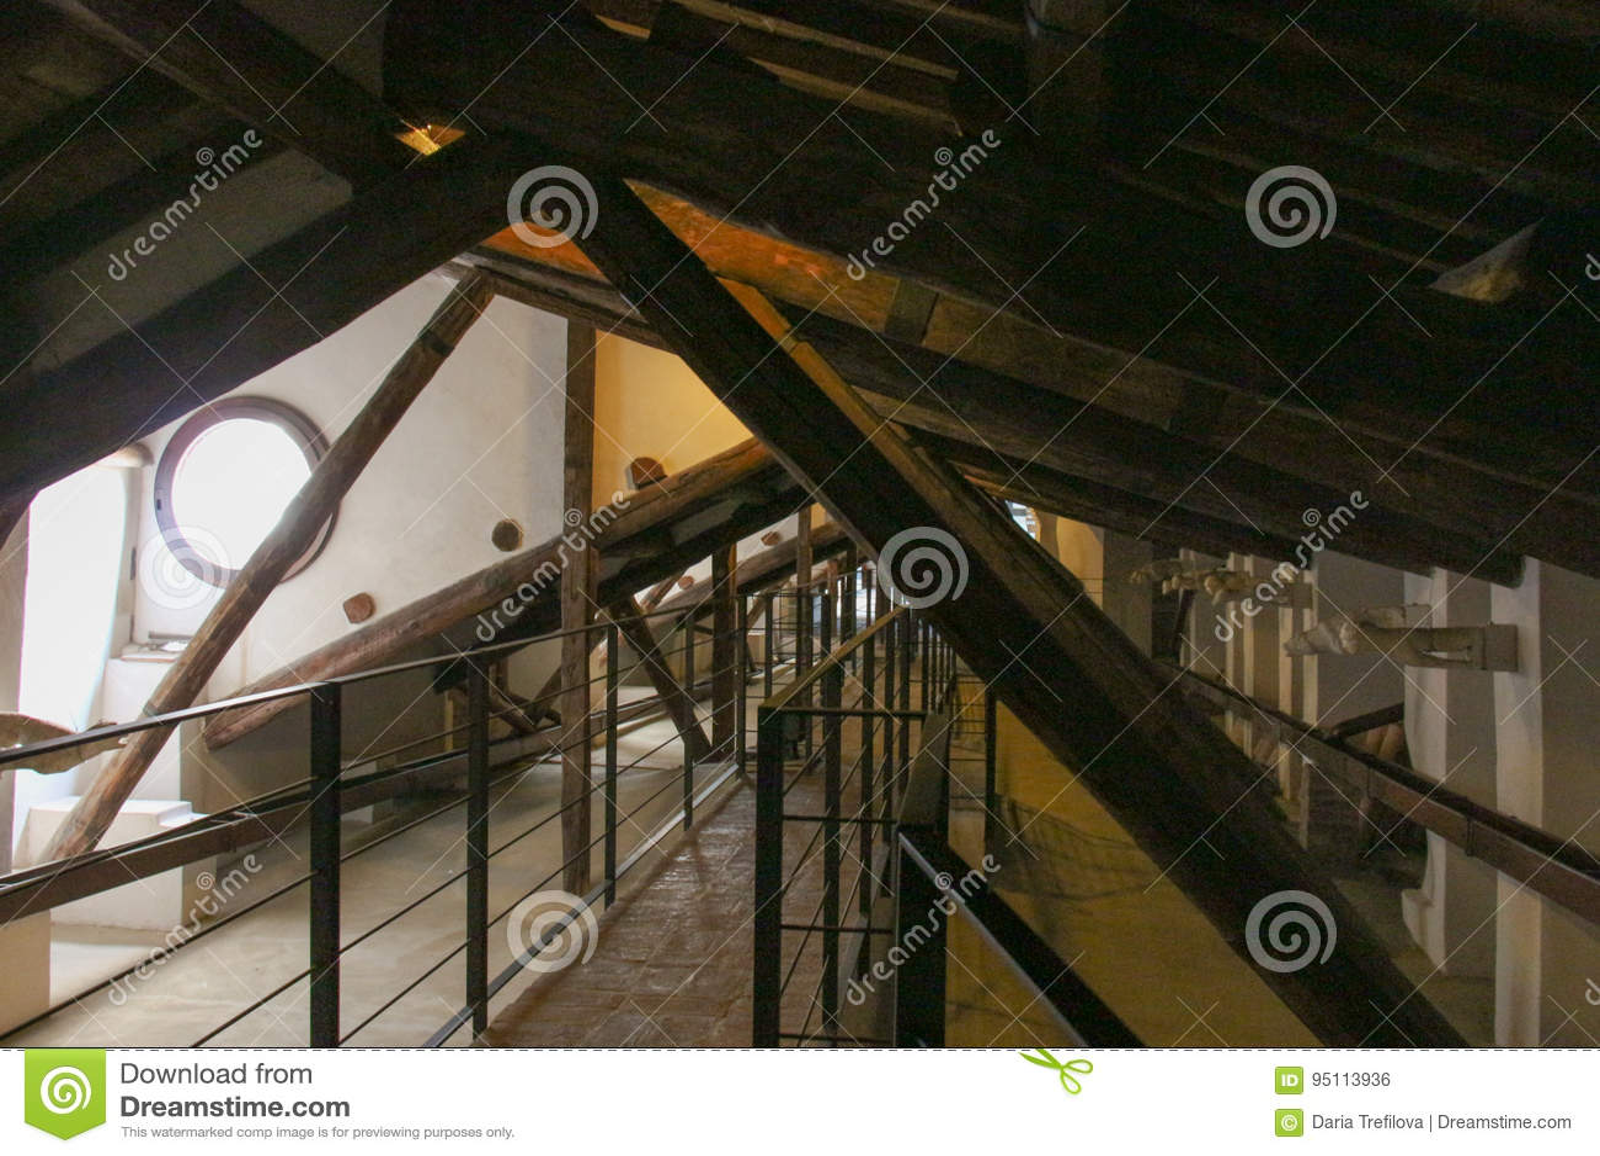 View of the Duomo di Siena attic. Metropolitan Cathedral of Santa Maria Assunta. Tuscany. Italy.